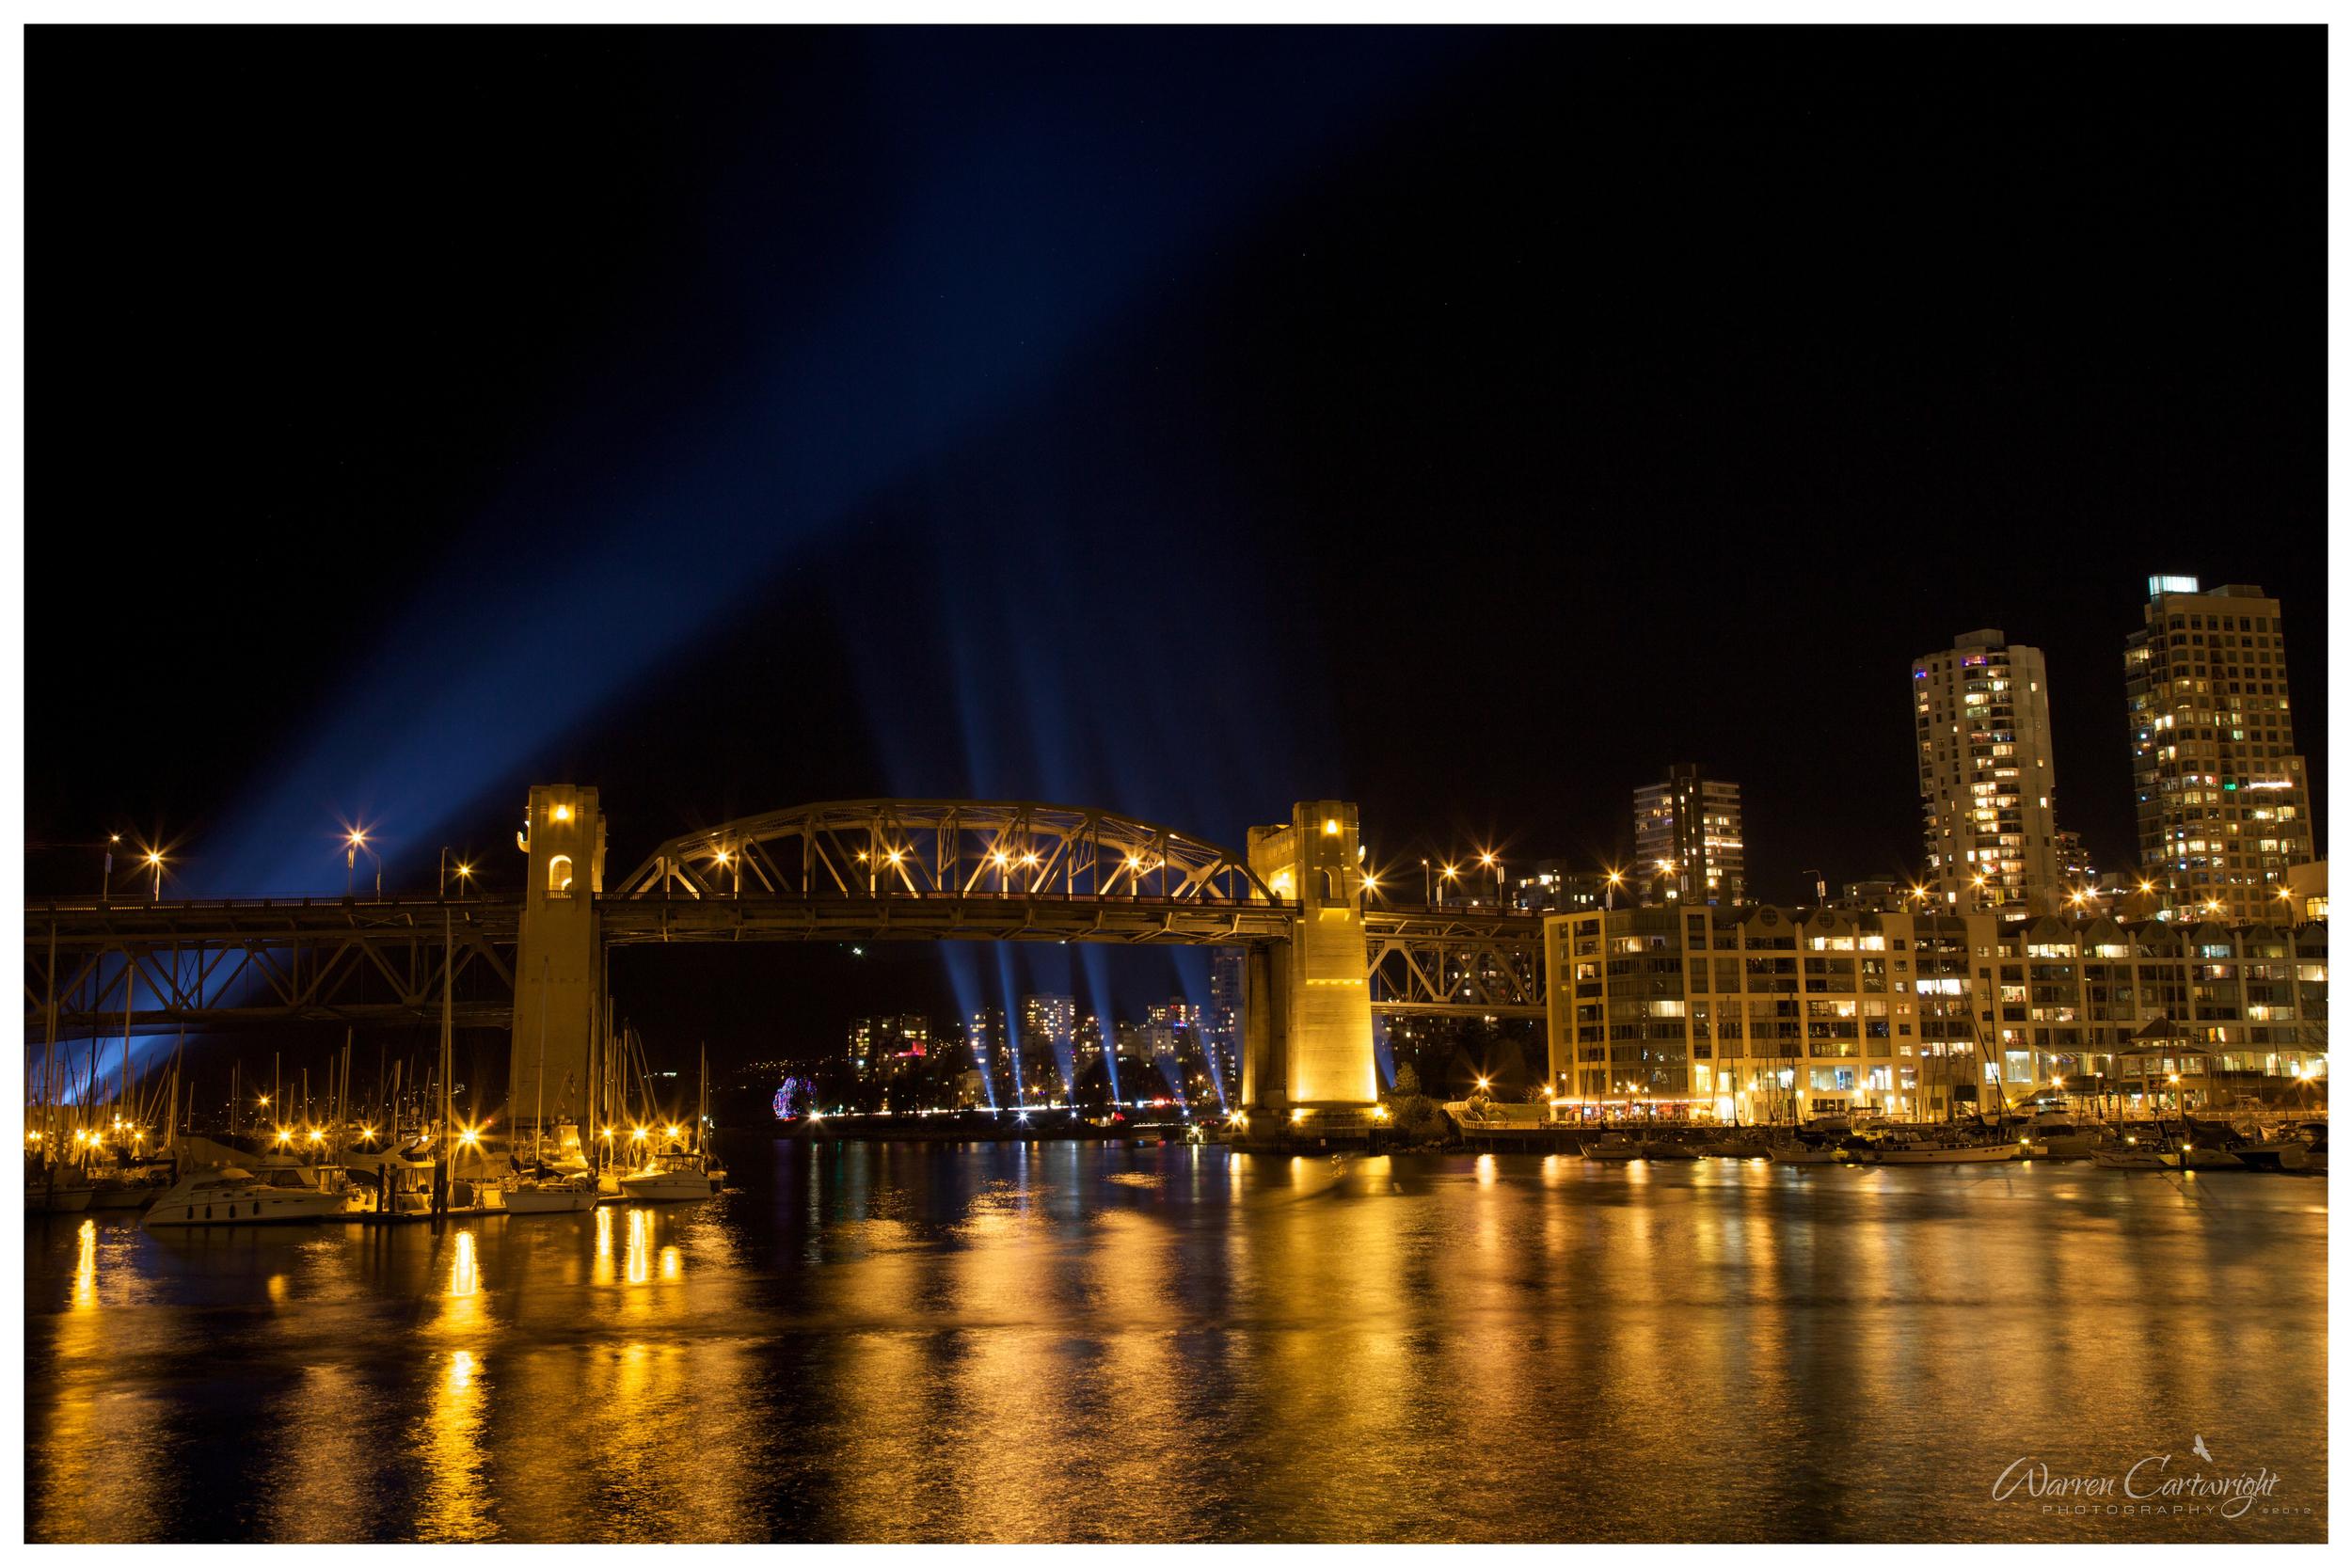 vancouver_burrard_bridge.jpg